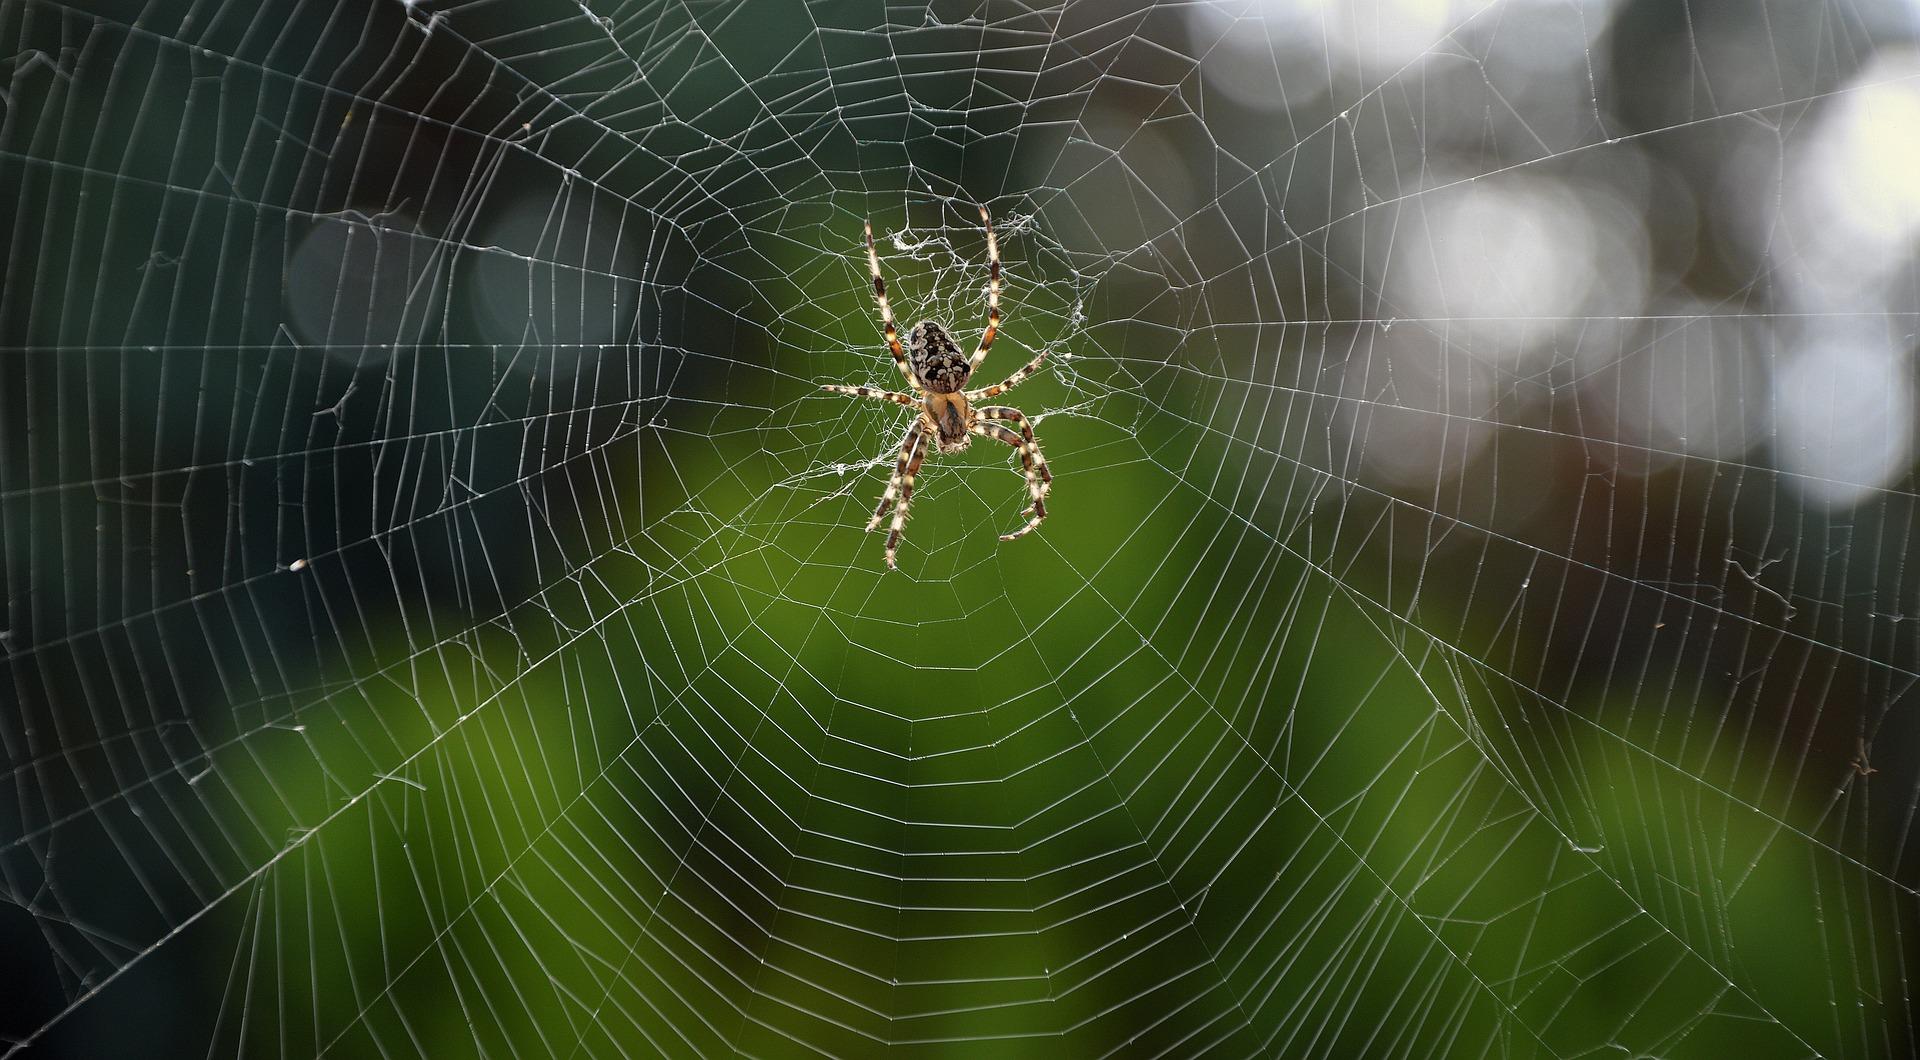 Koli Spider in Marathi कोळी किटकांविषयी मनोरंजक तथ्य